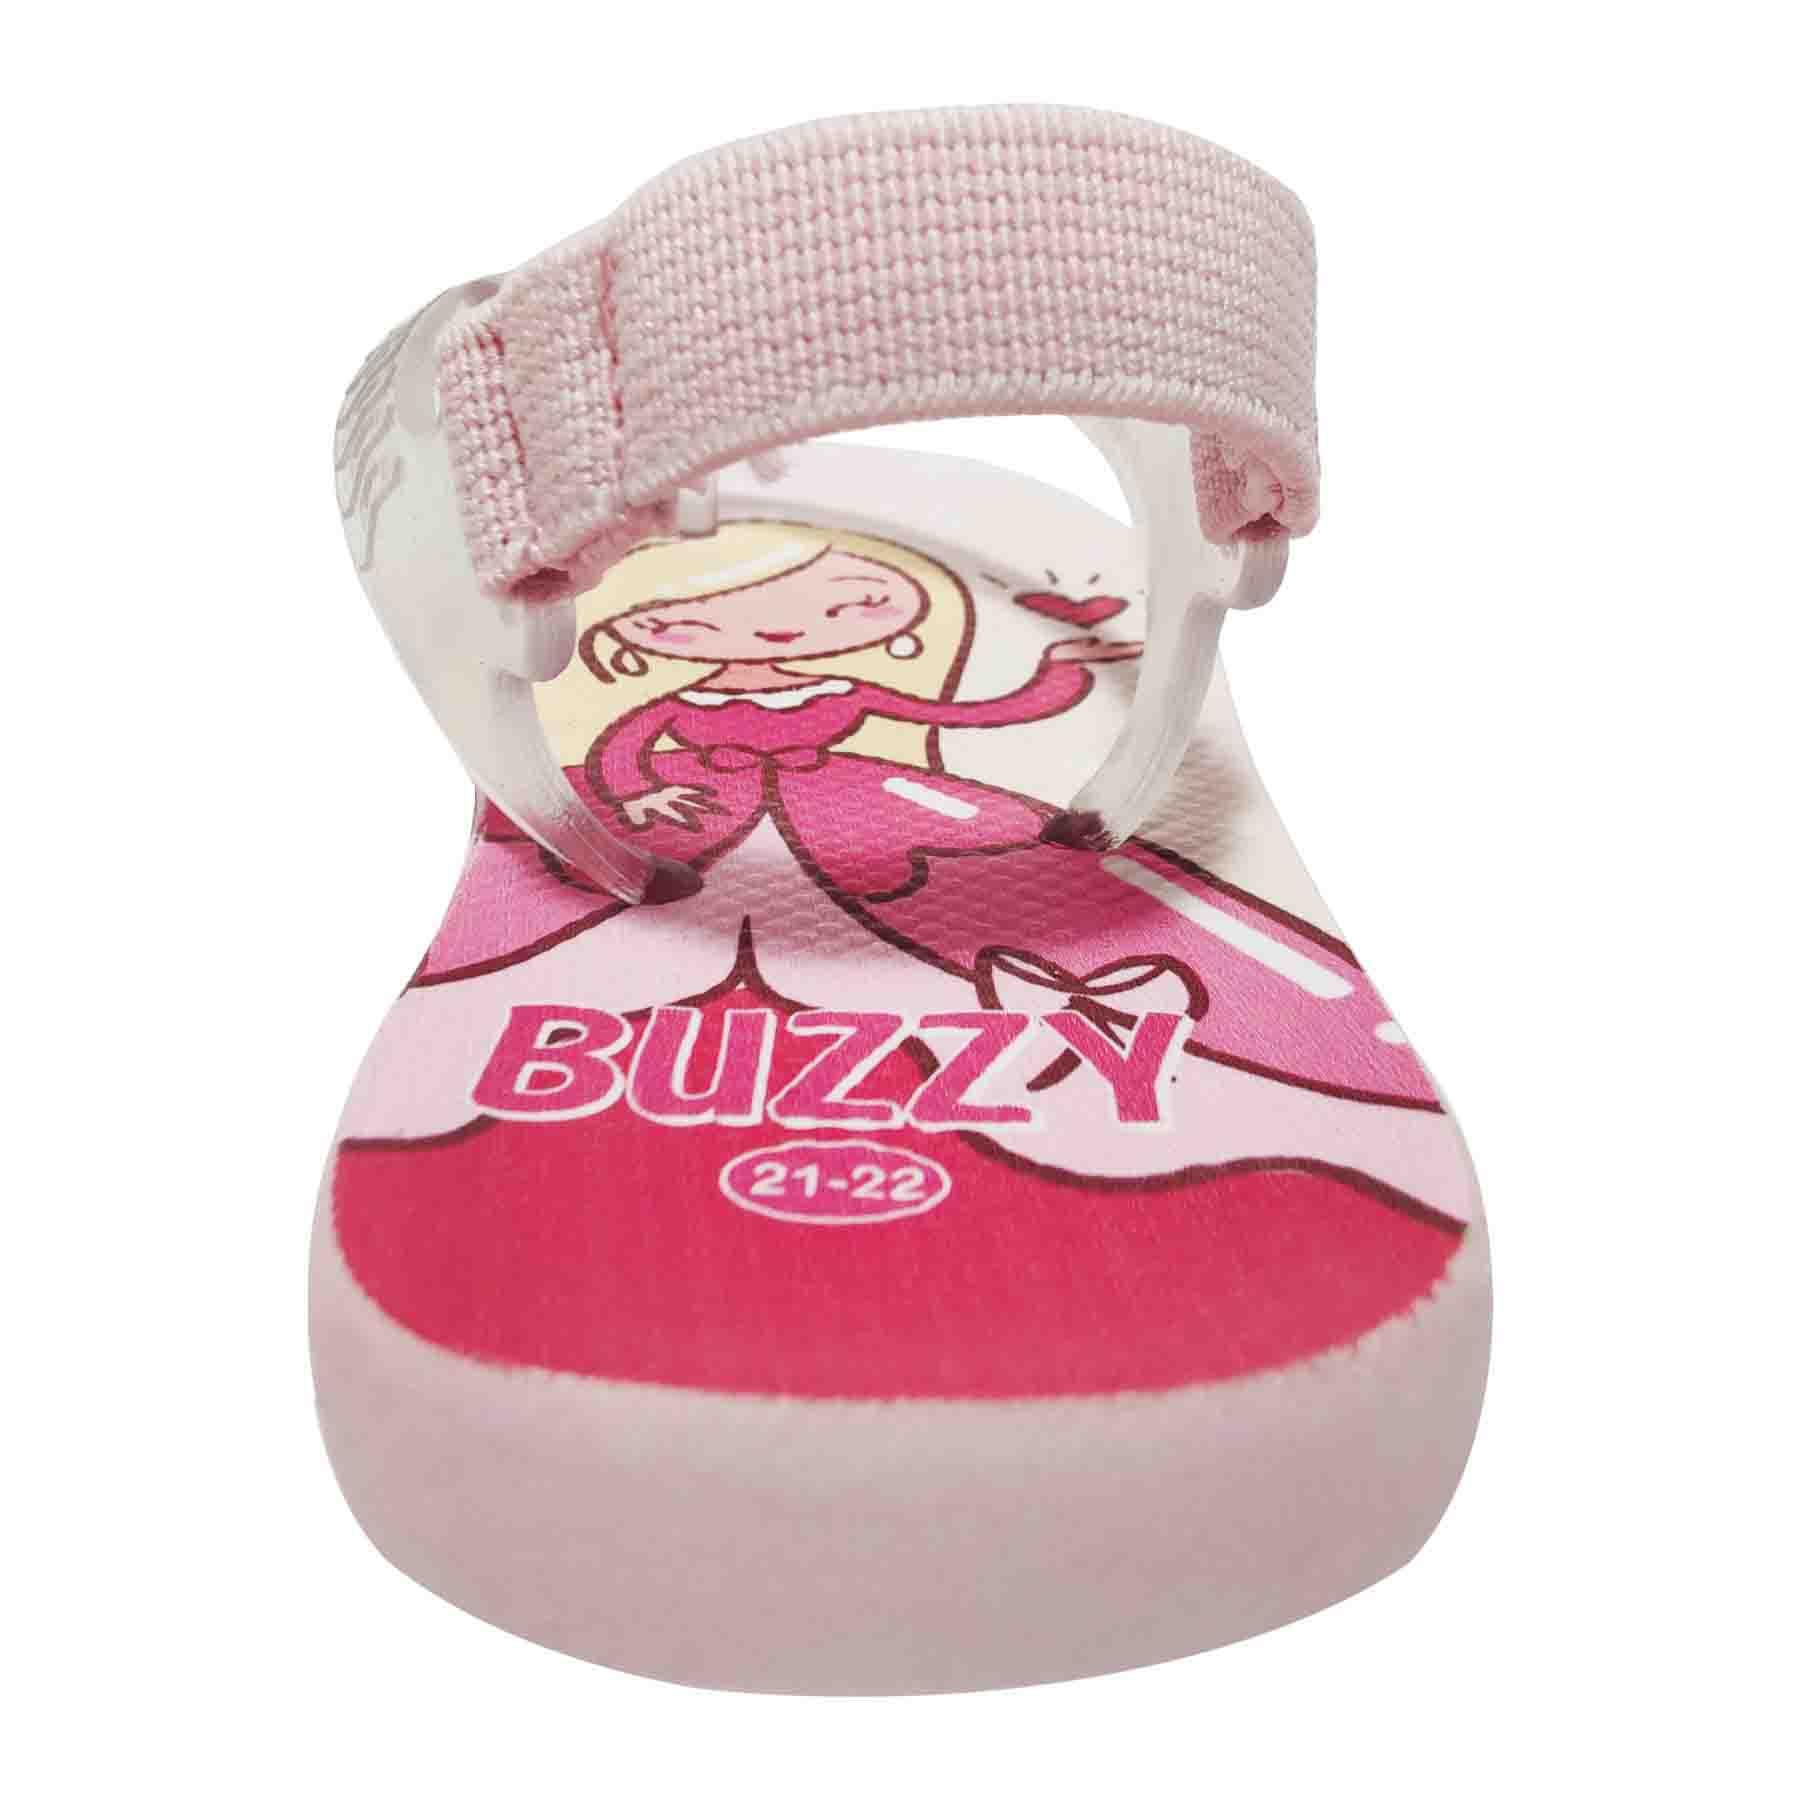 Chinelo Buzzy Sandália Infantil Princesa Bebê Meninas BZ017